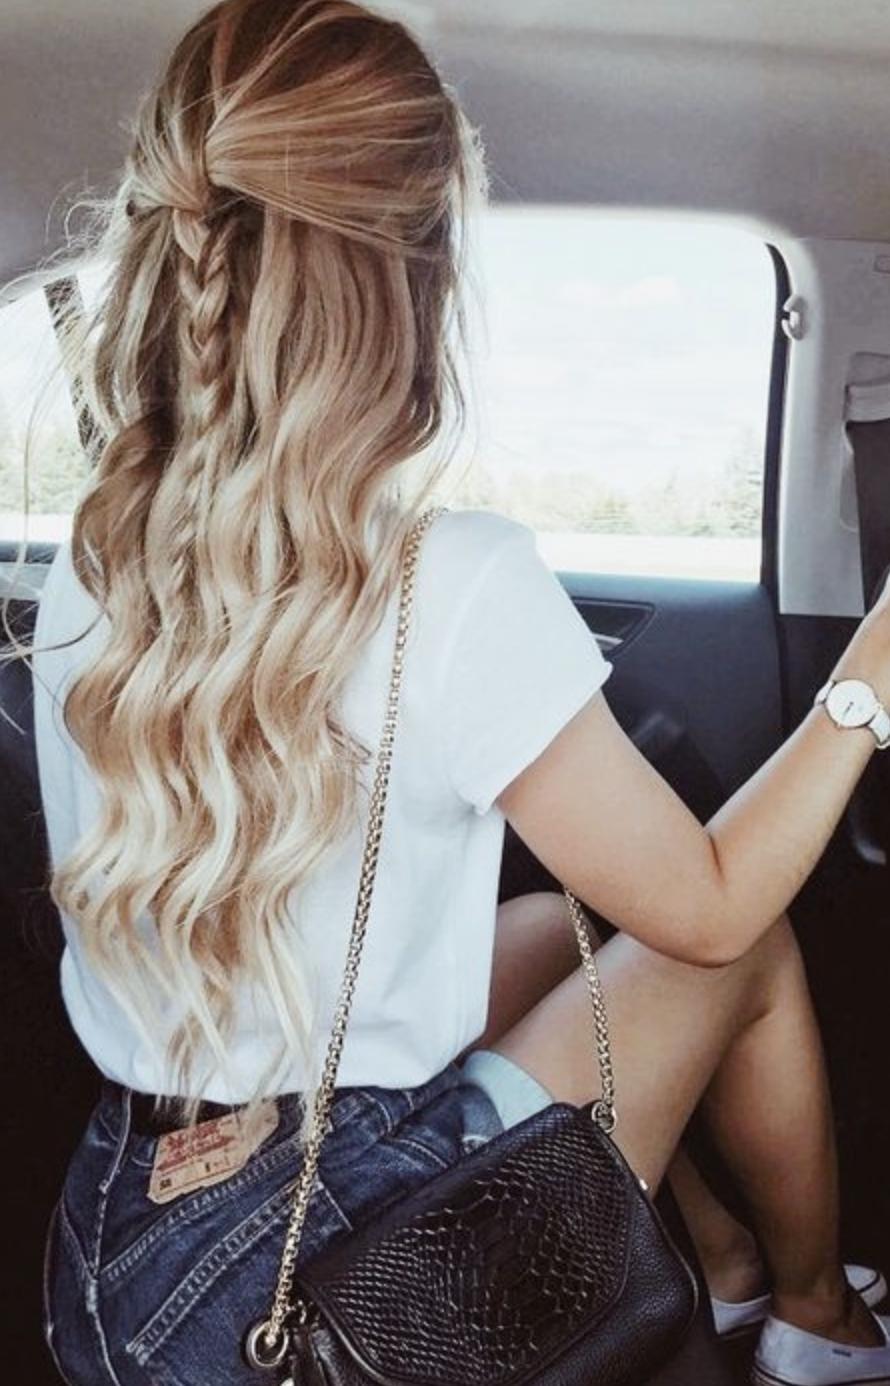 Pin by kaylee blum on goldilocks pinterest hair style hair